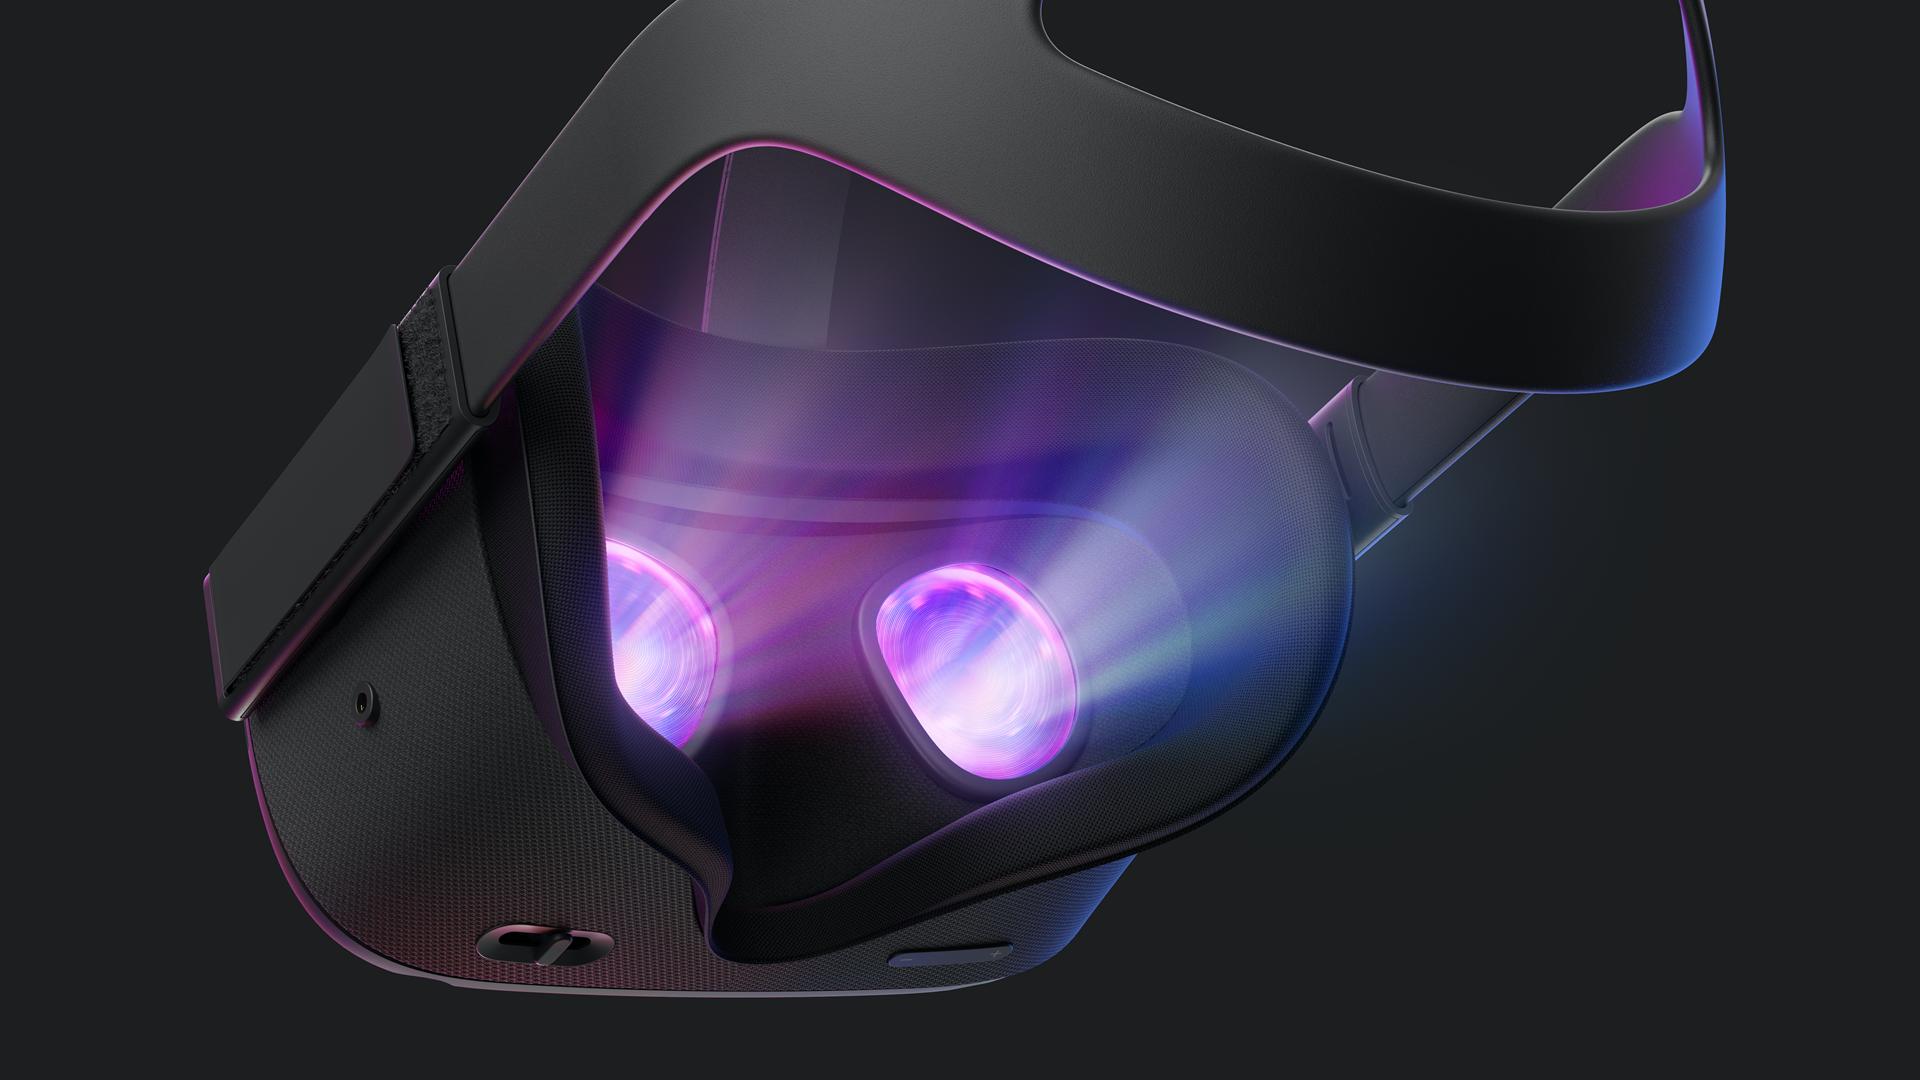 An original Oculus Quest on a dark background